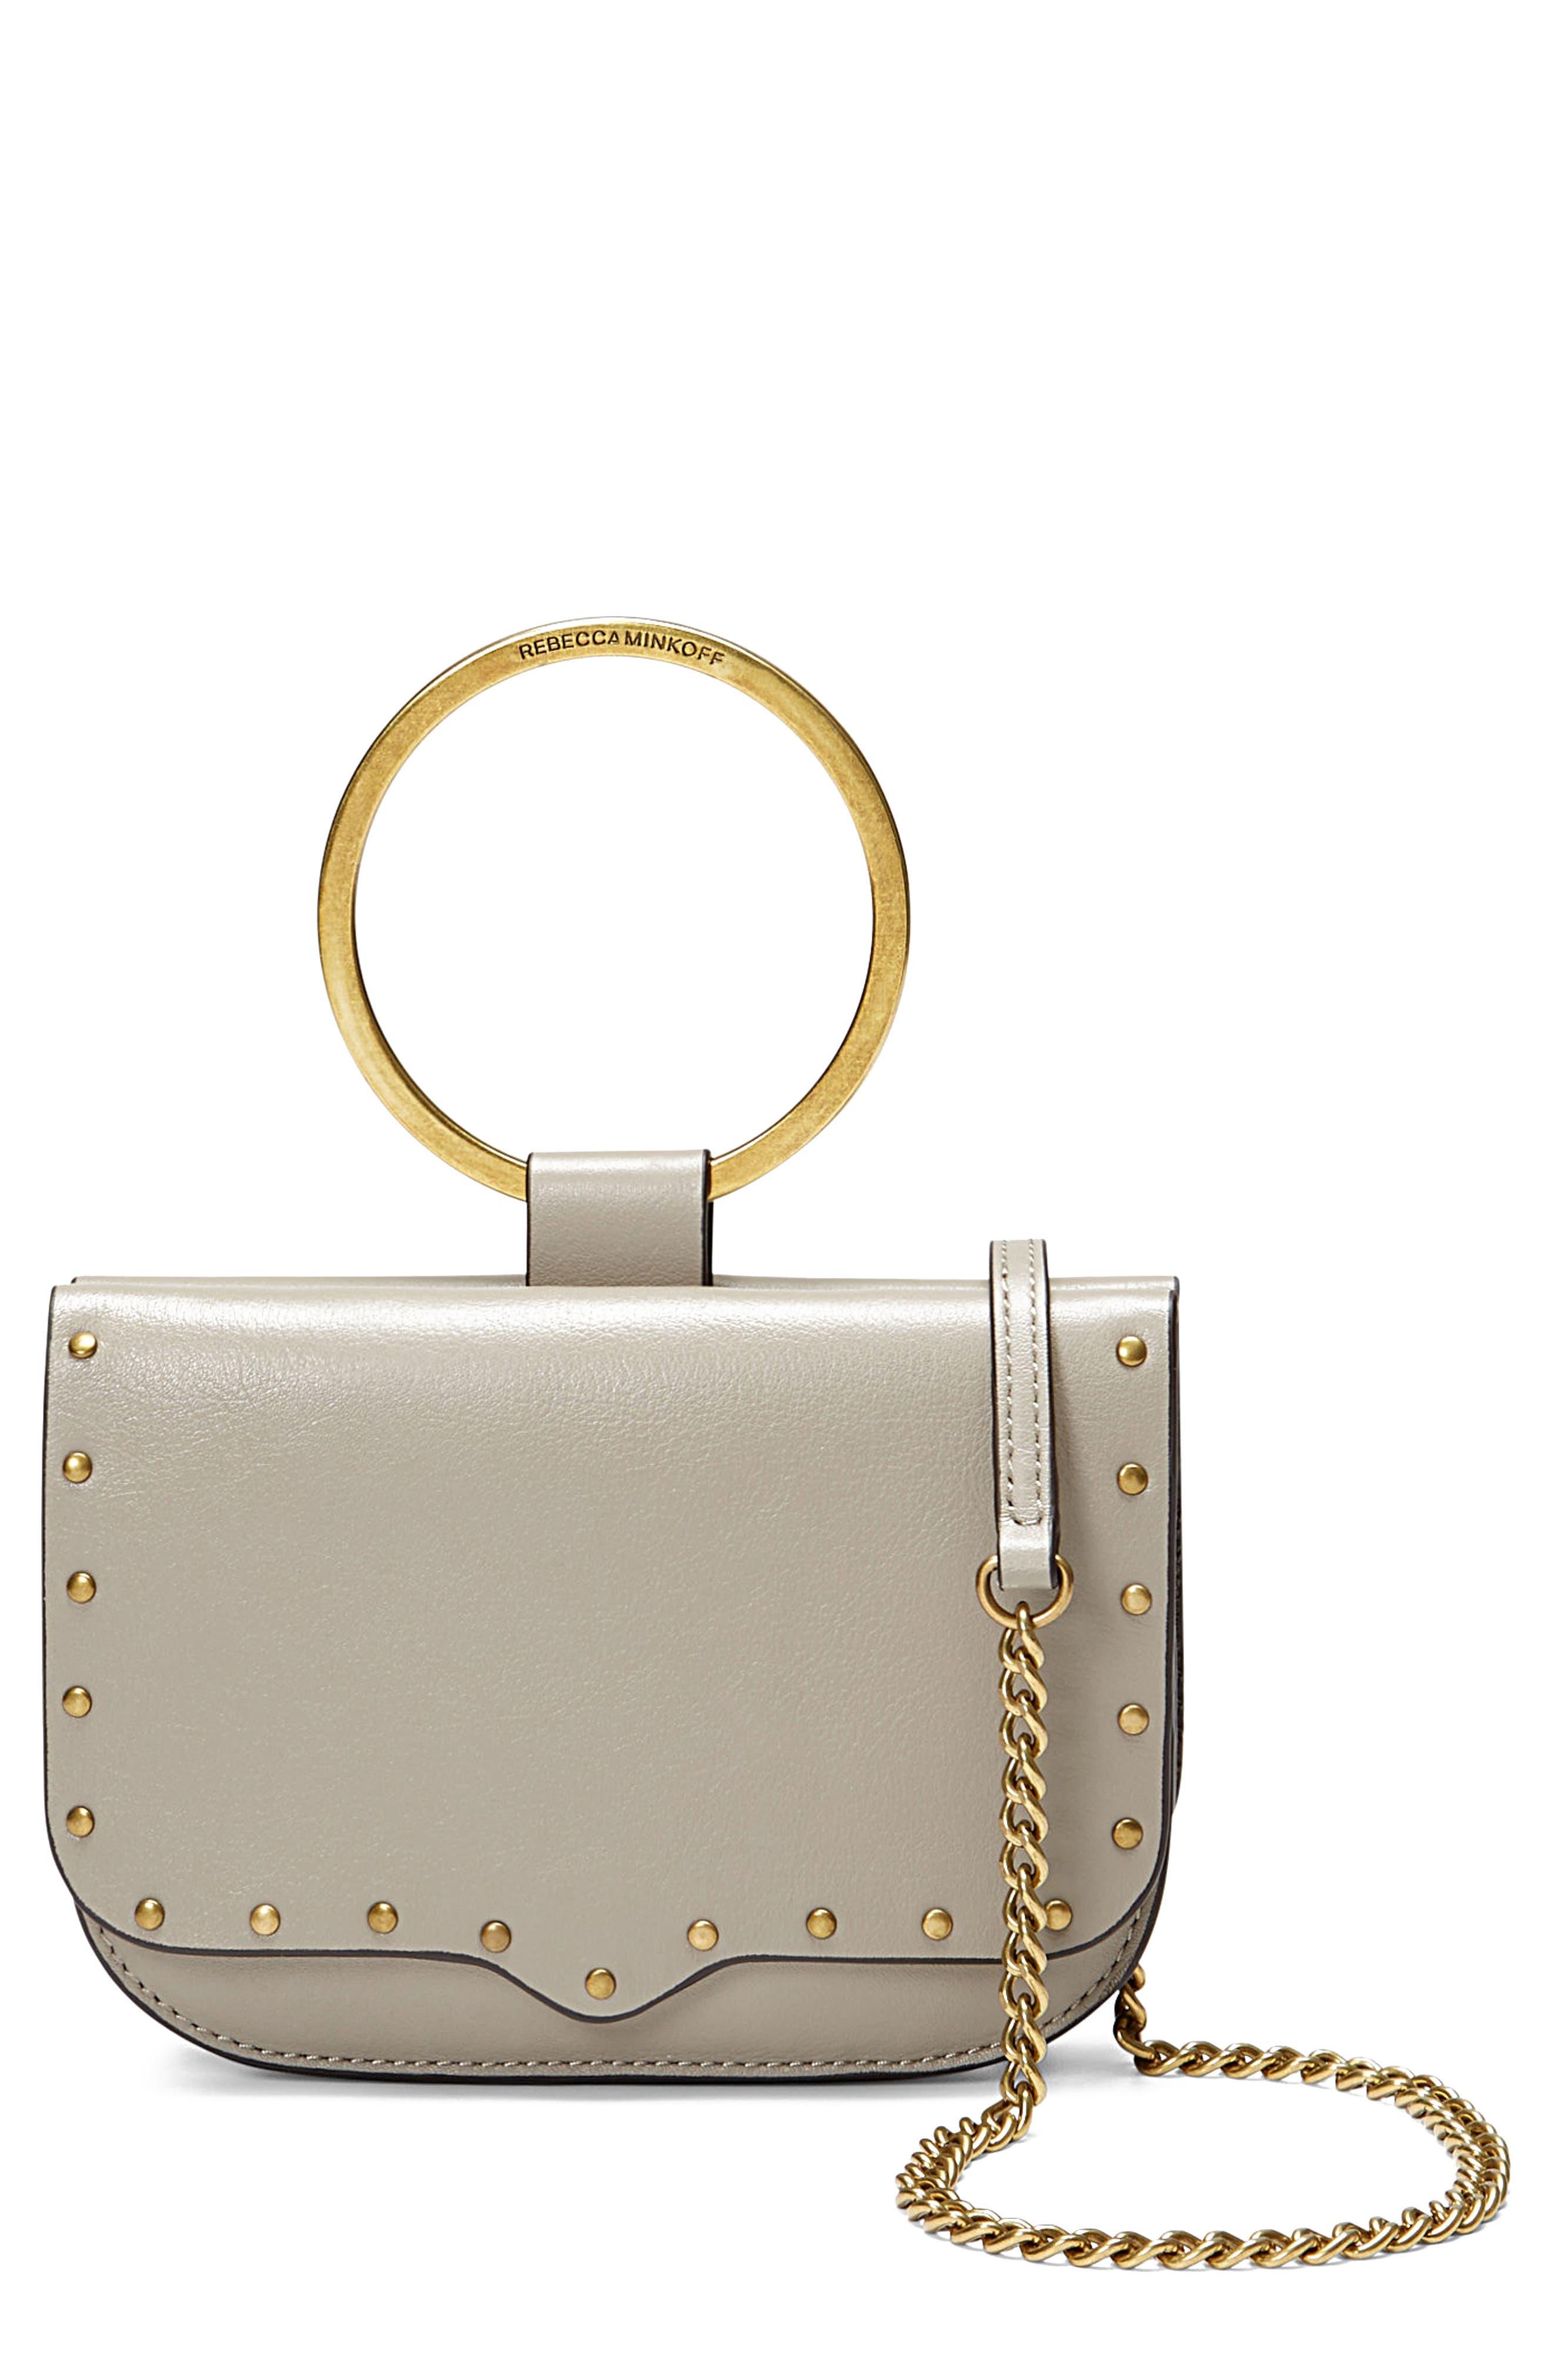 Rebecca Minkoff Ring Leather Crossbody Bag